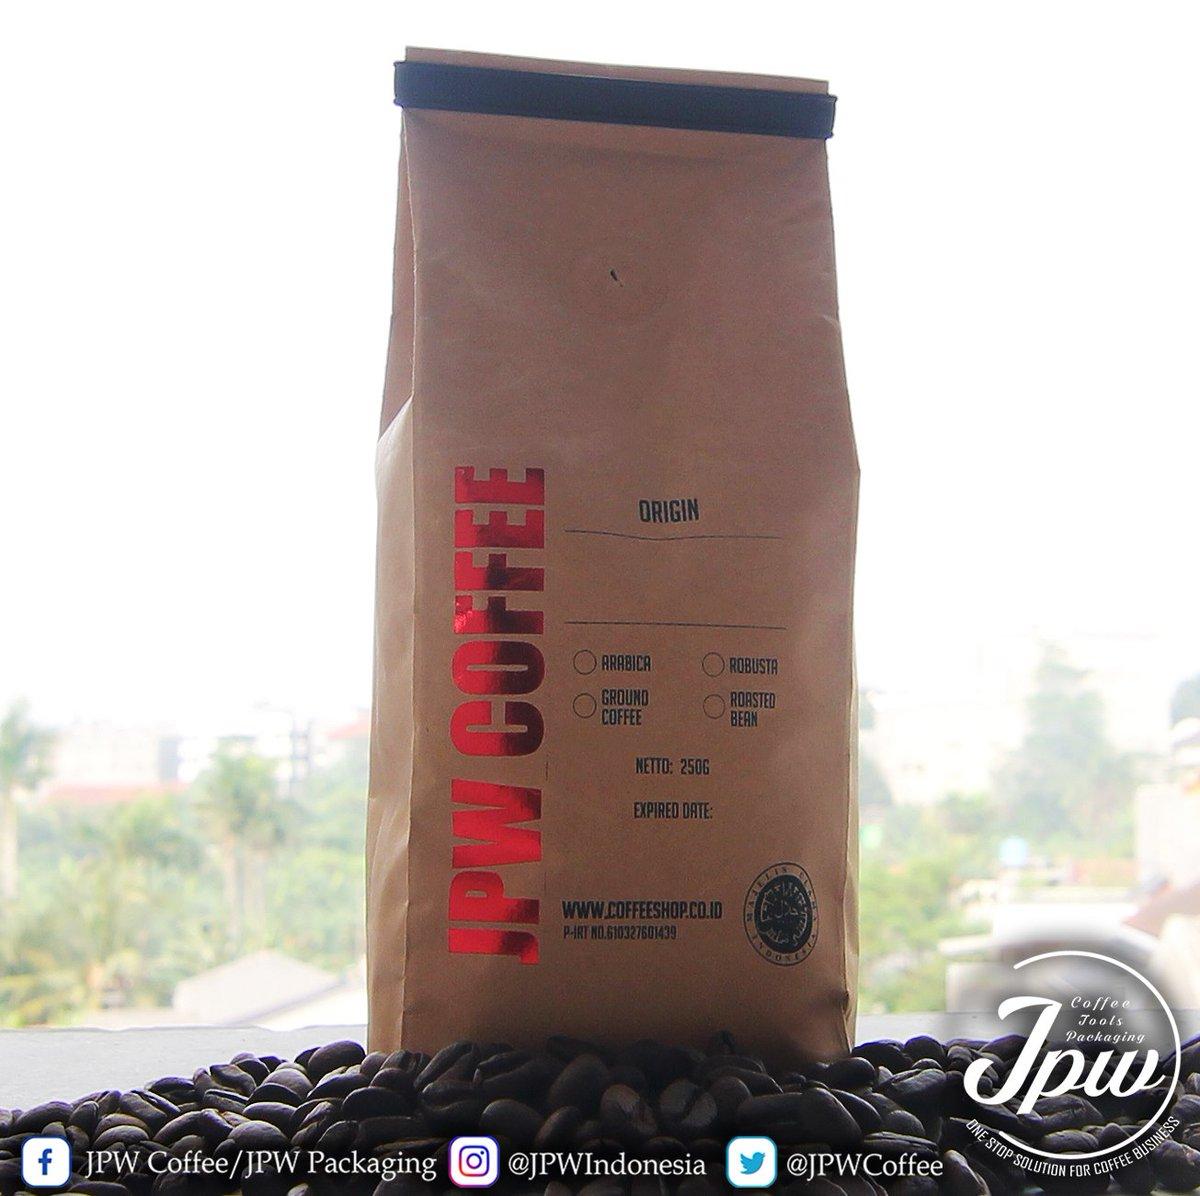 Otten Coffee Arabica Mandheling Honey Process 200g Bubuk Kopi Biji Arabika Extra Koffie Warung Tinggi Premium 1 Kg Source 0 Replies